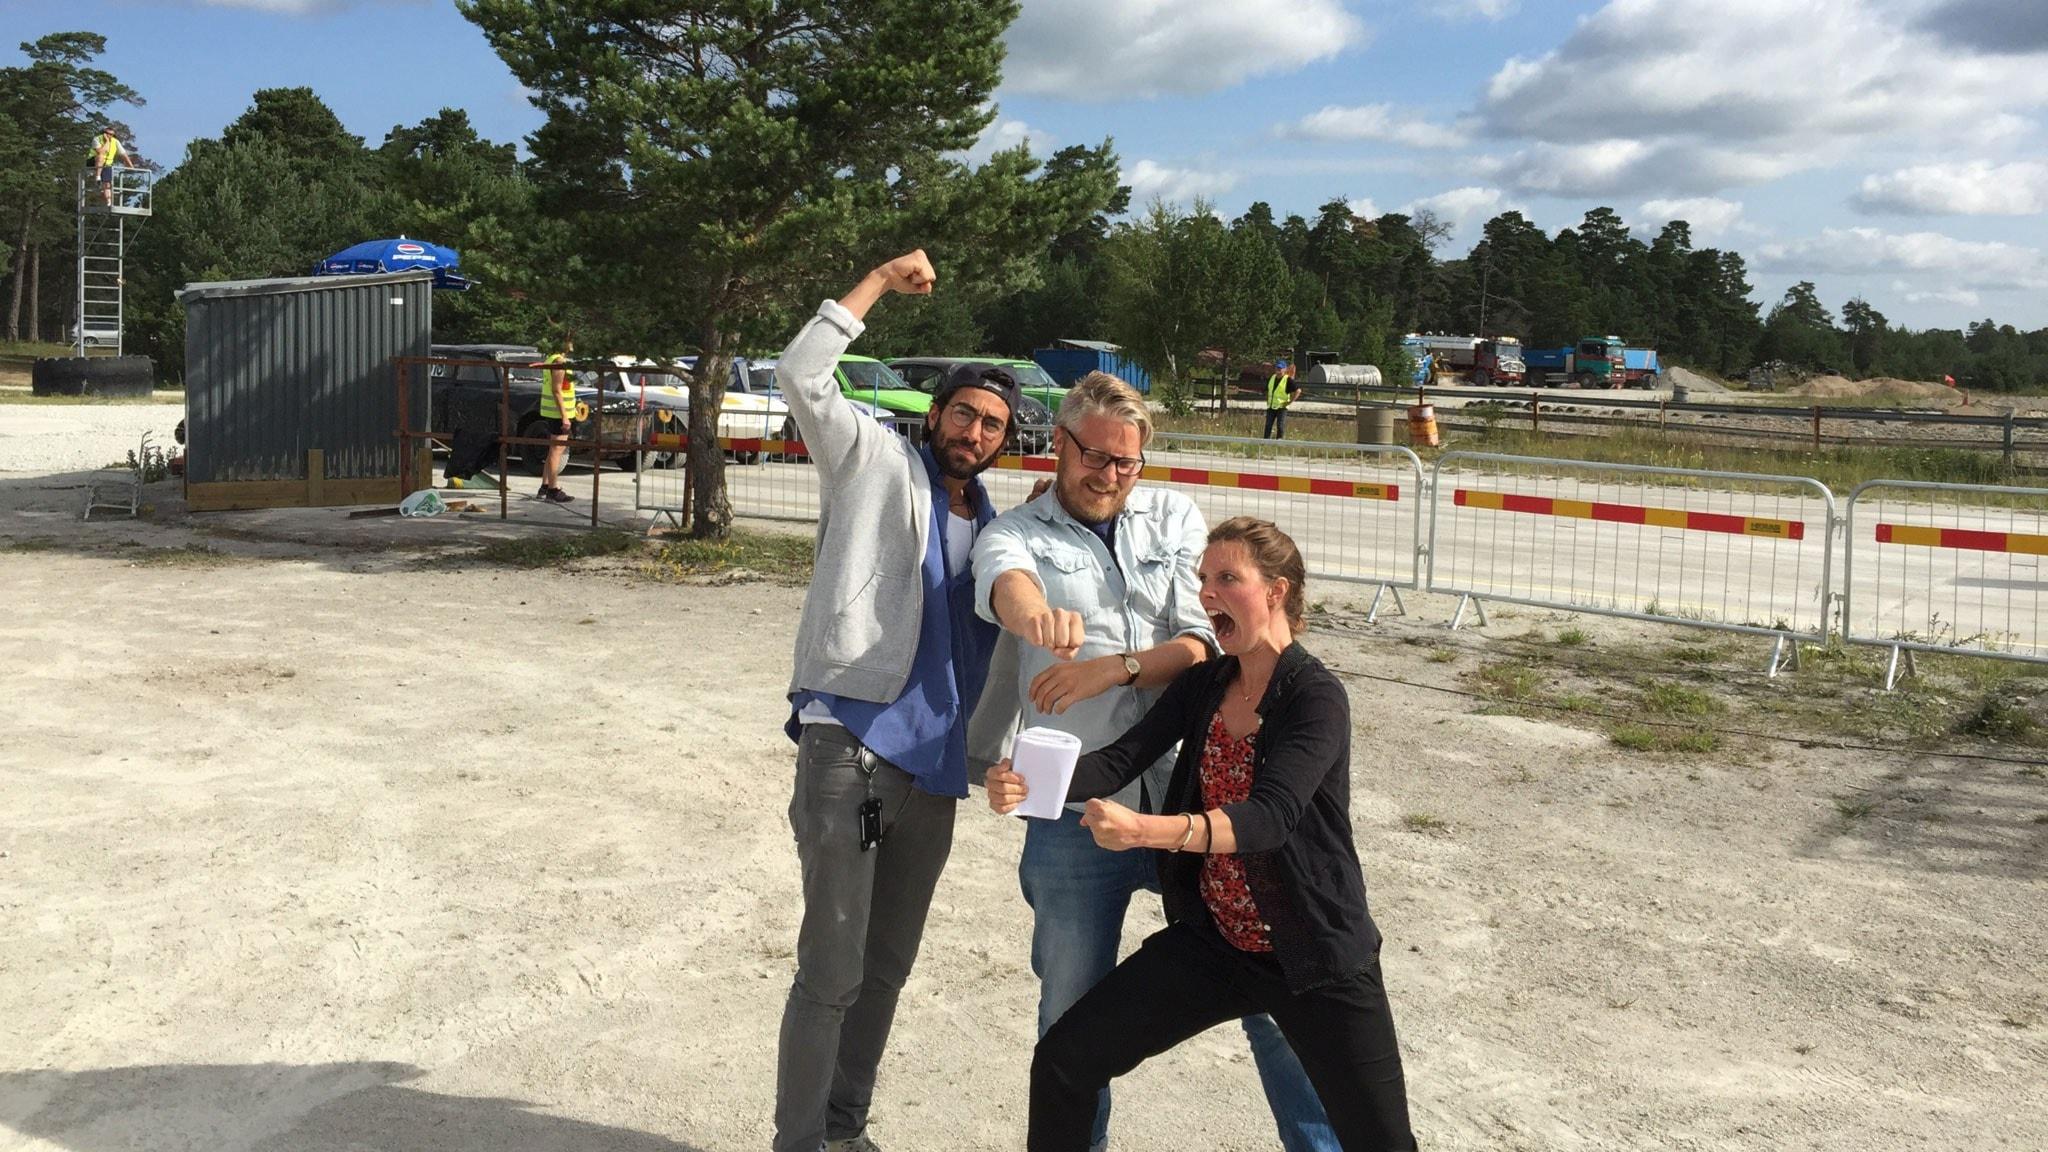 Anton Kalm, Demir Lilja och Amanda Heijbel. Foto: Sveriges Radio